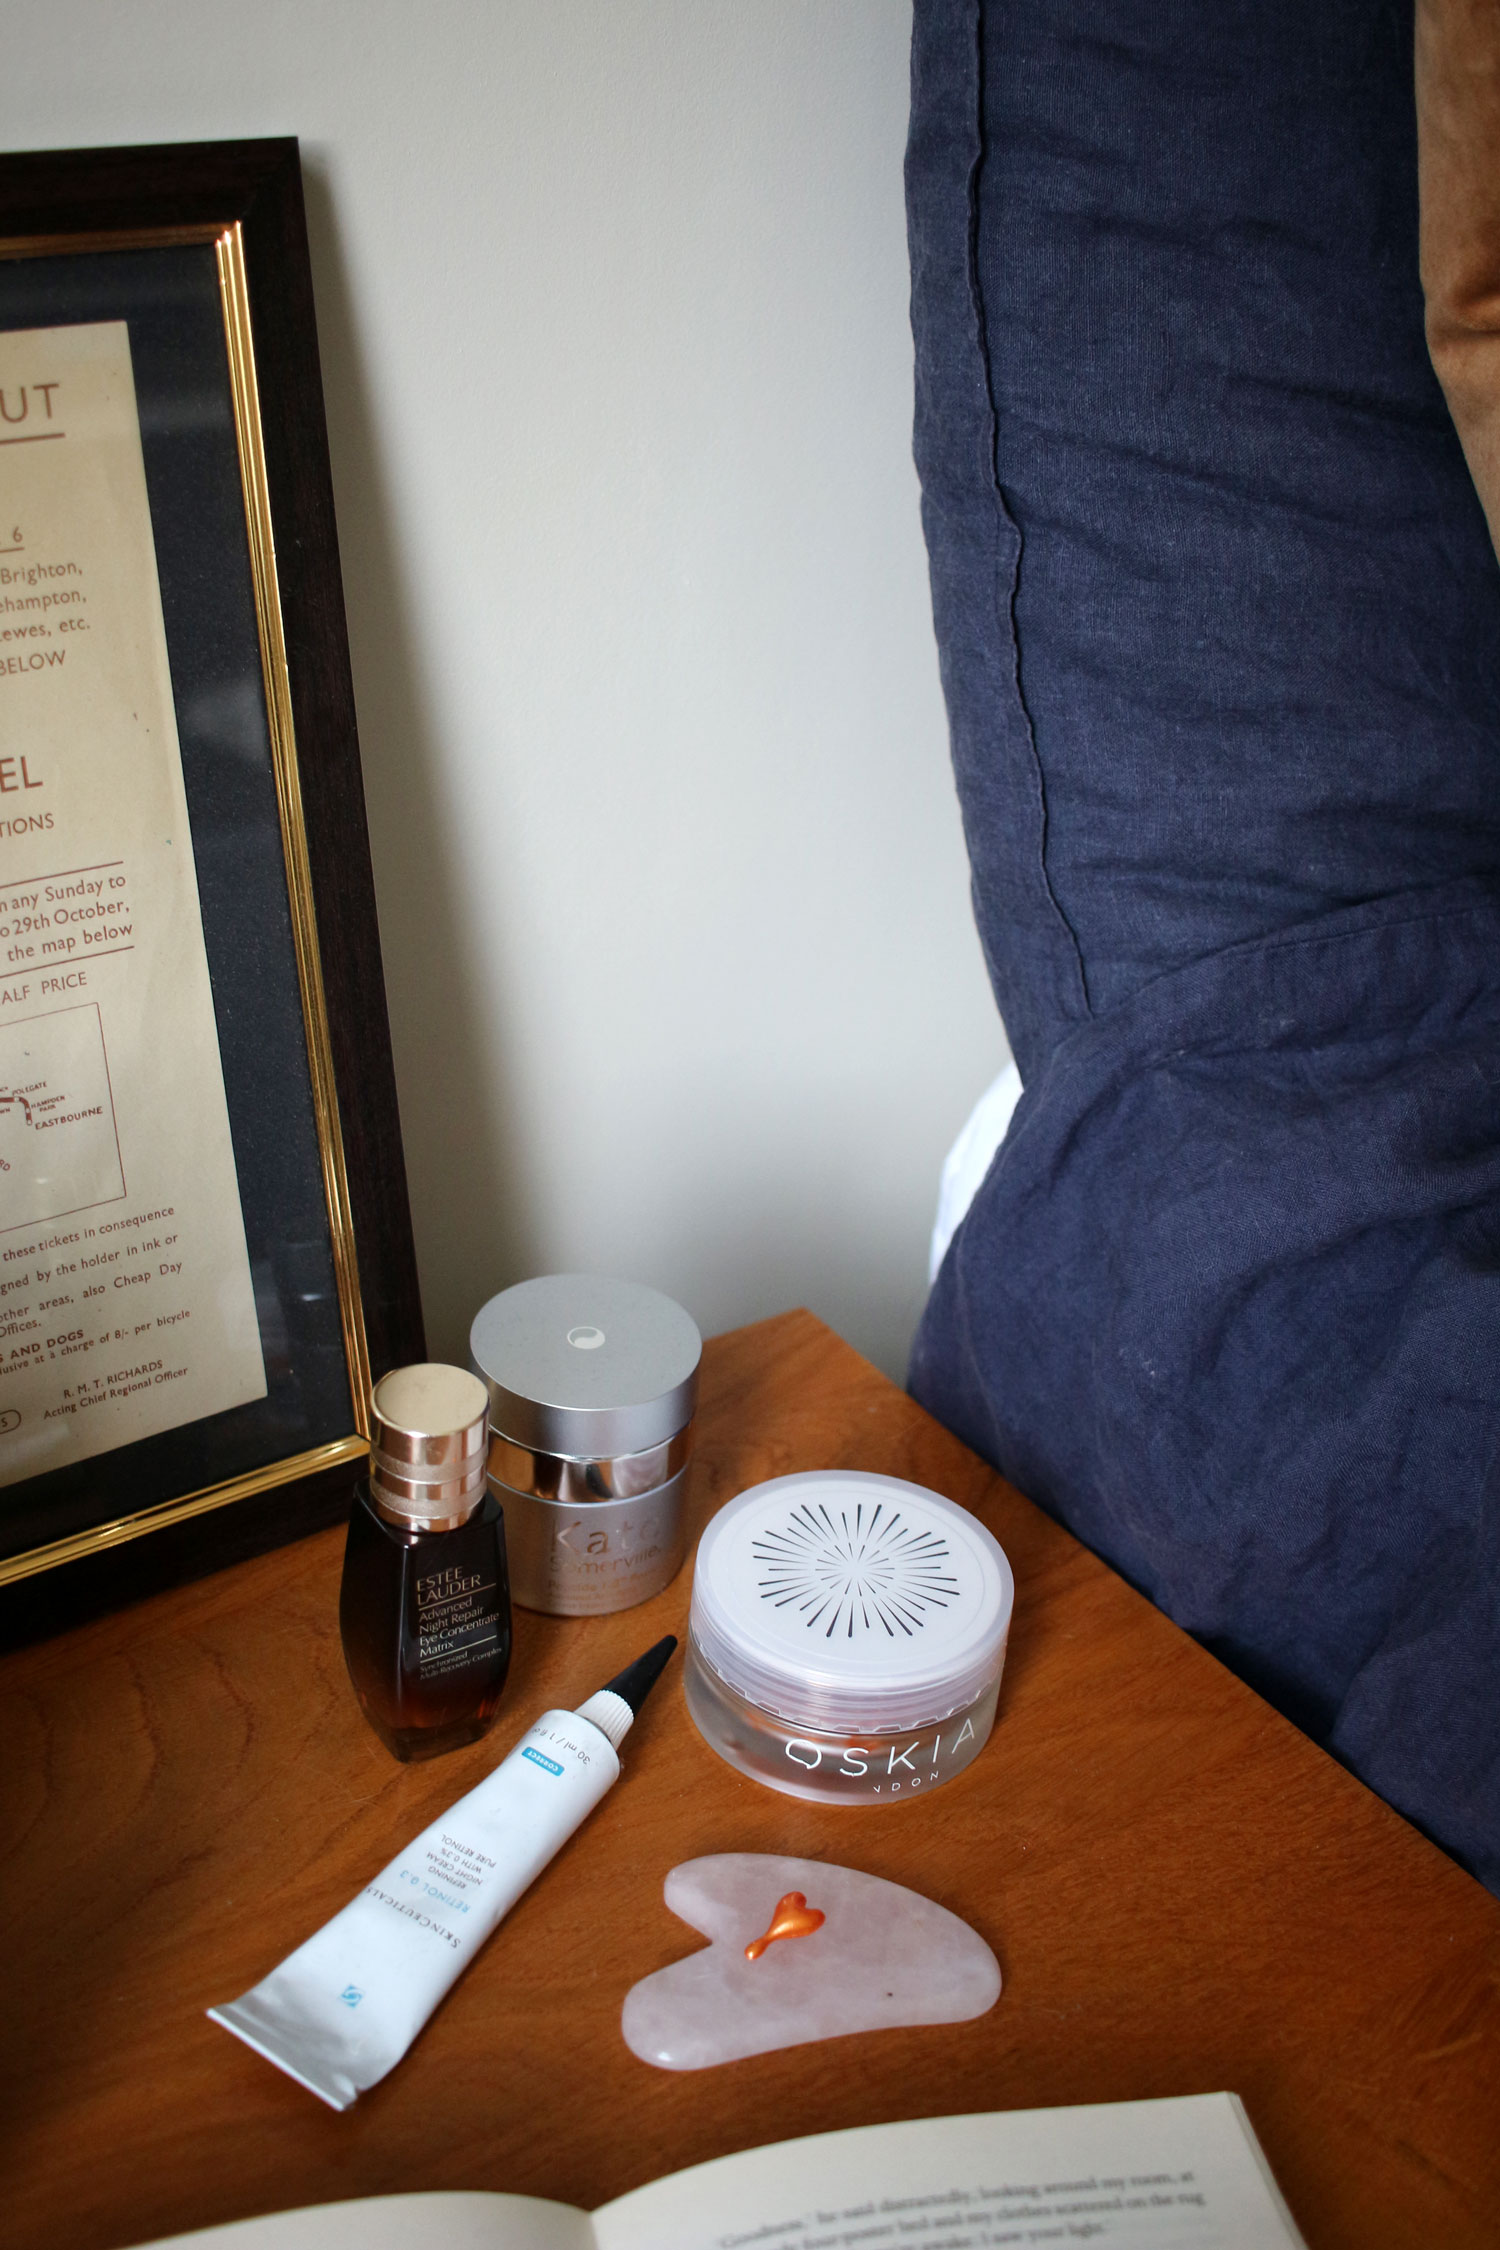 bedside-beauty-oskia-vitamin-c-kate-somerville-k8-power-cream-skinceuticals-retinol